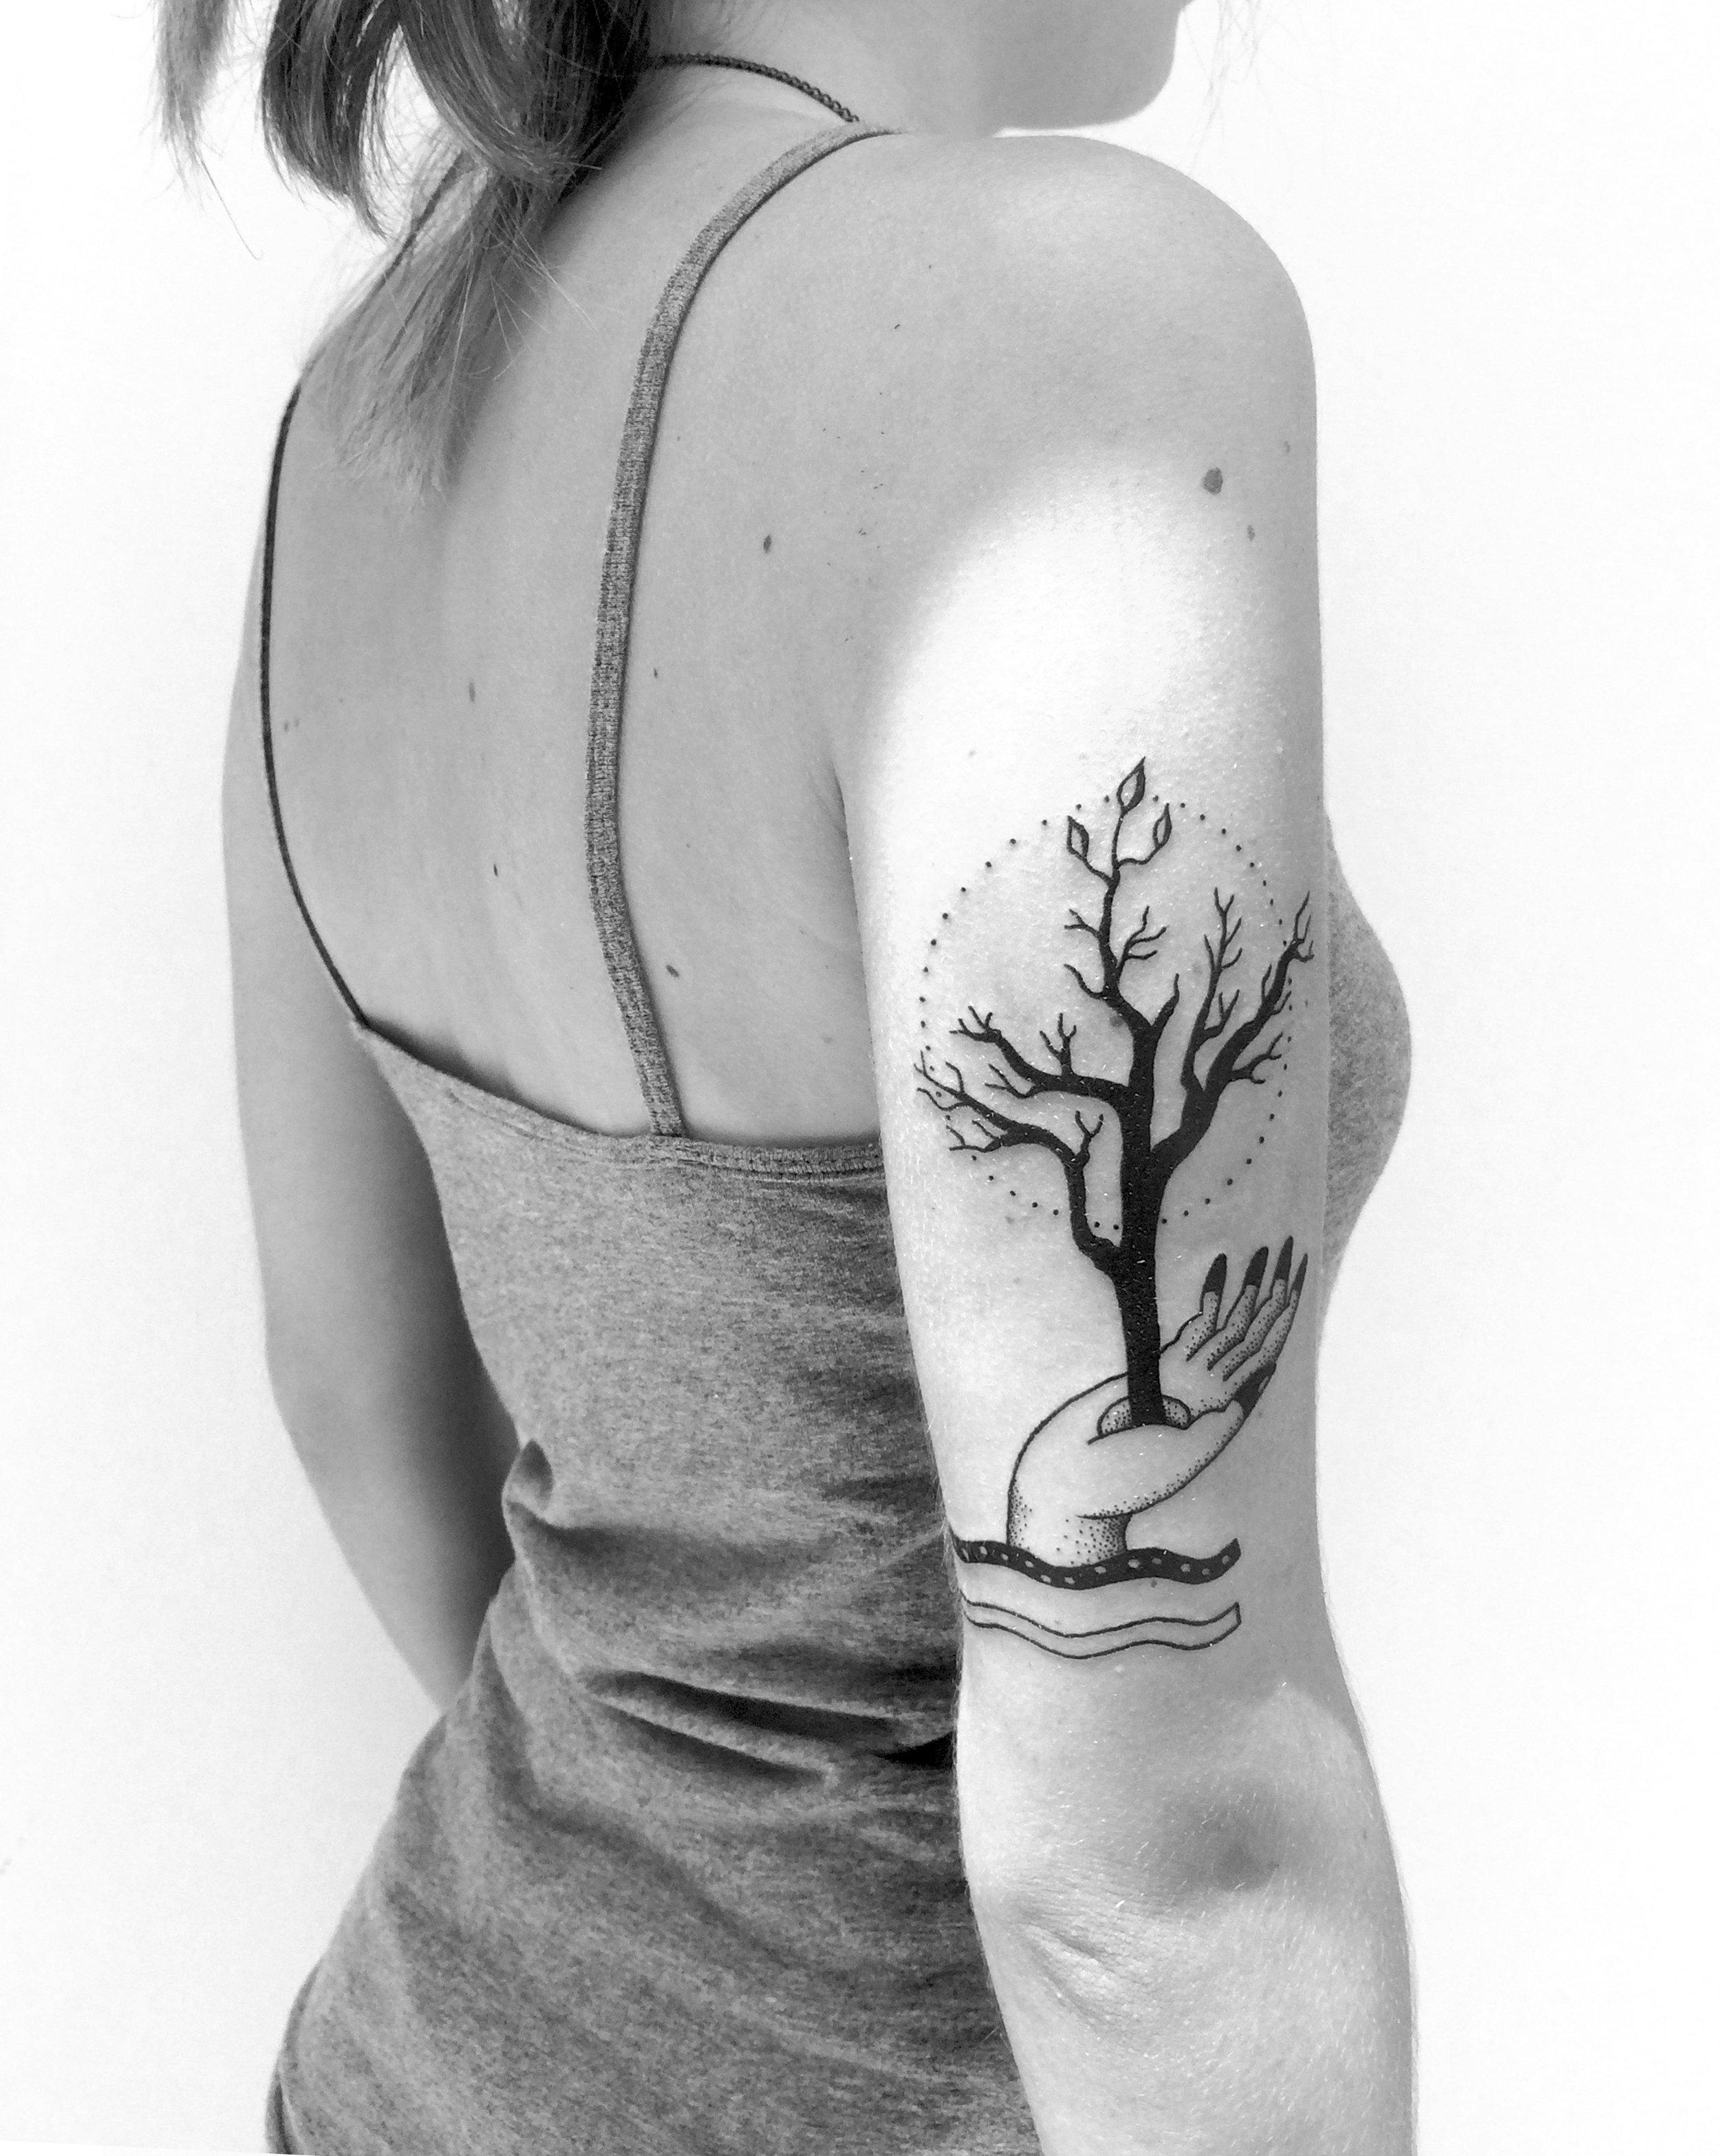 Tami_hopf_tattoos